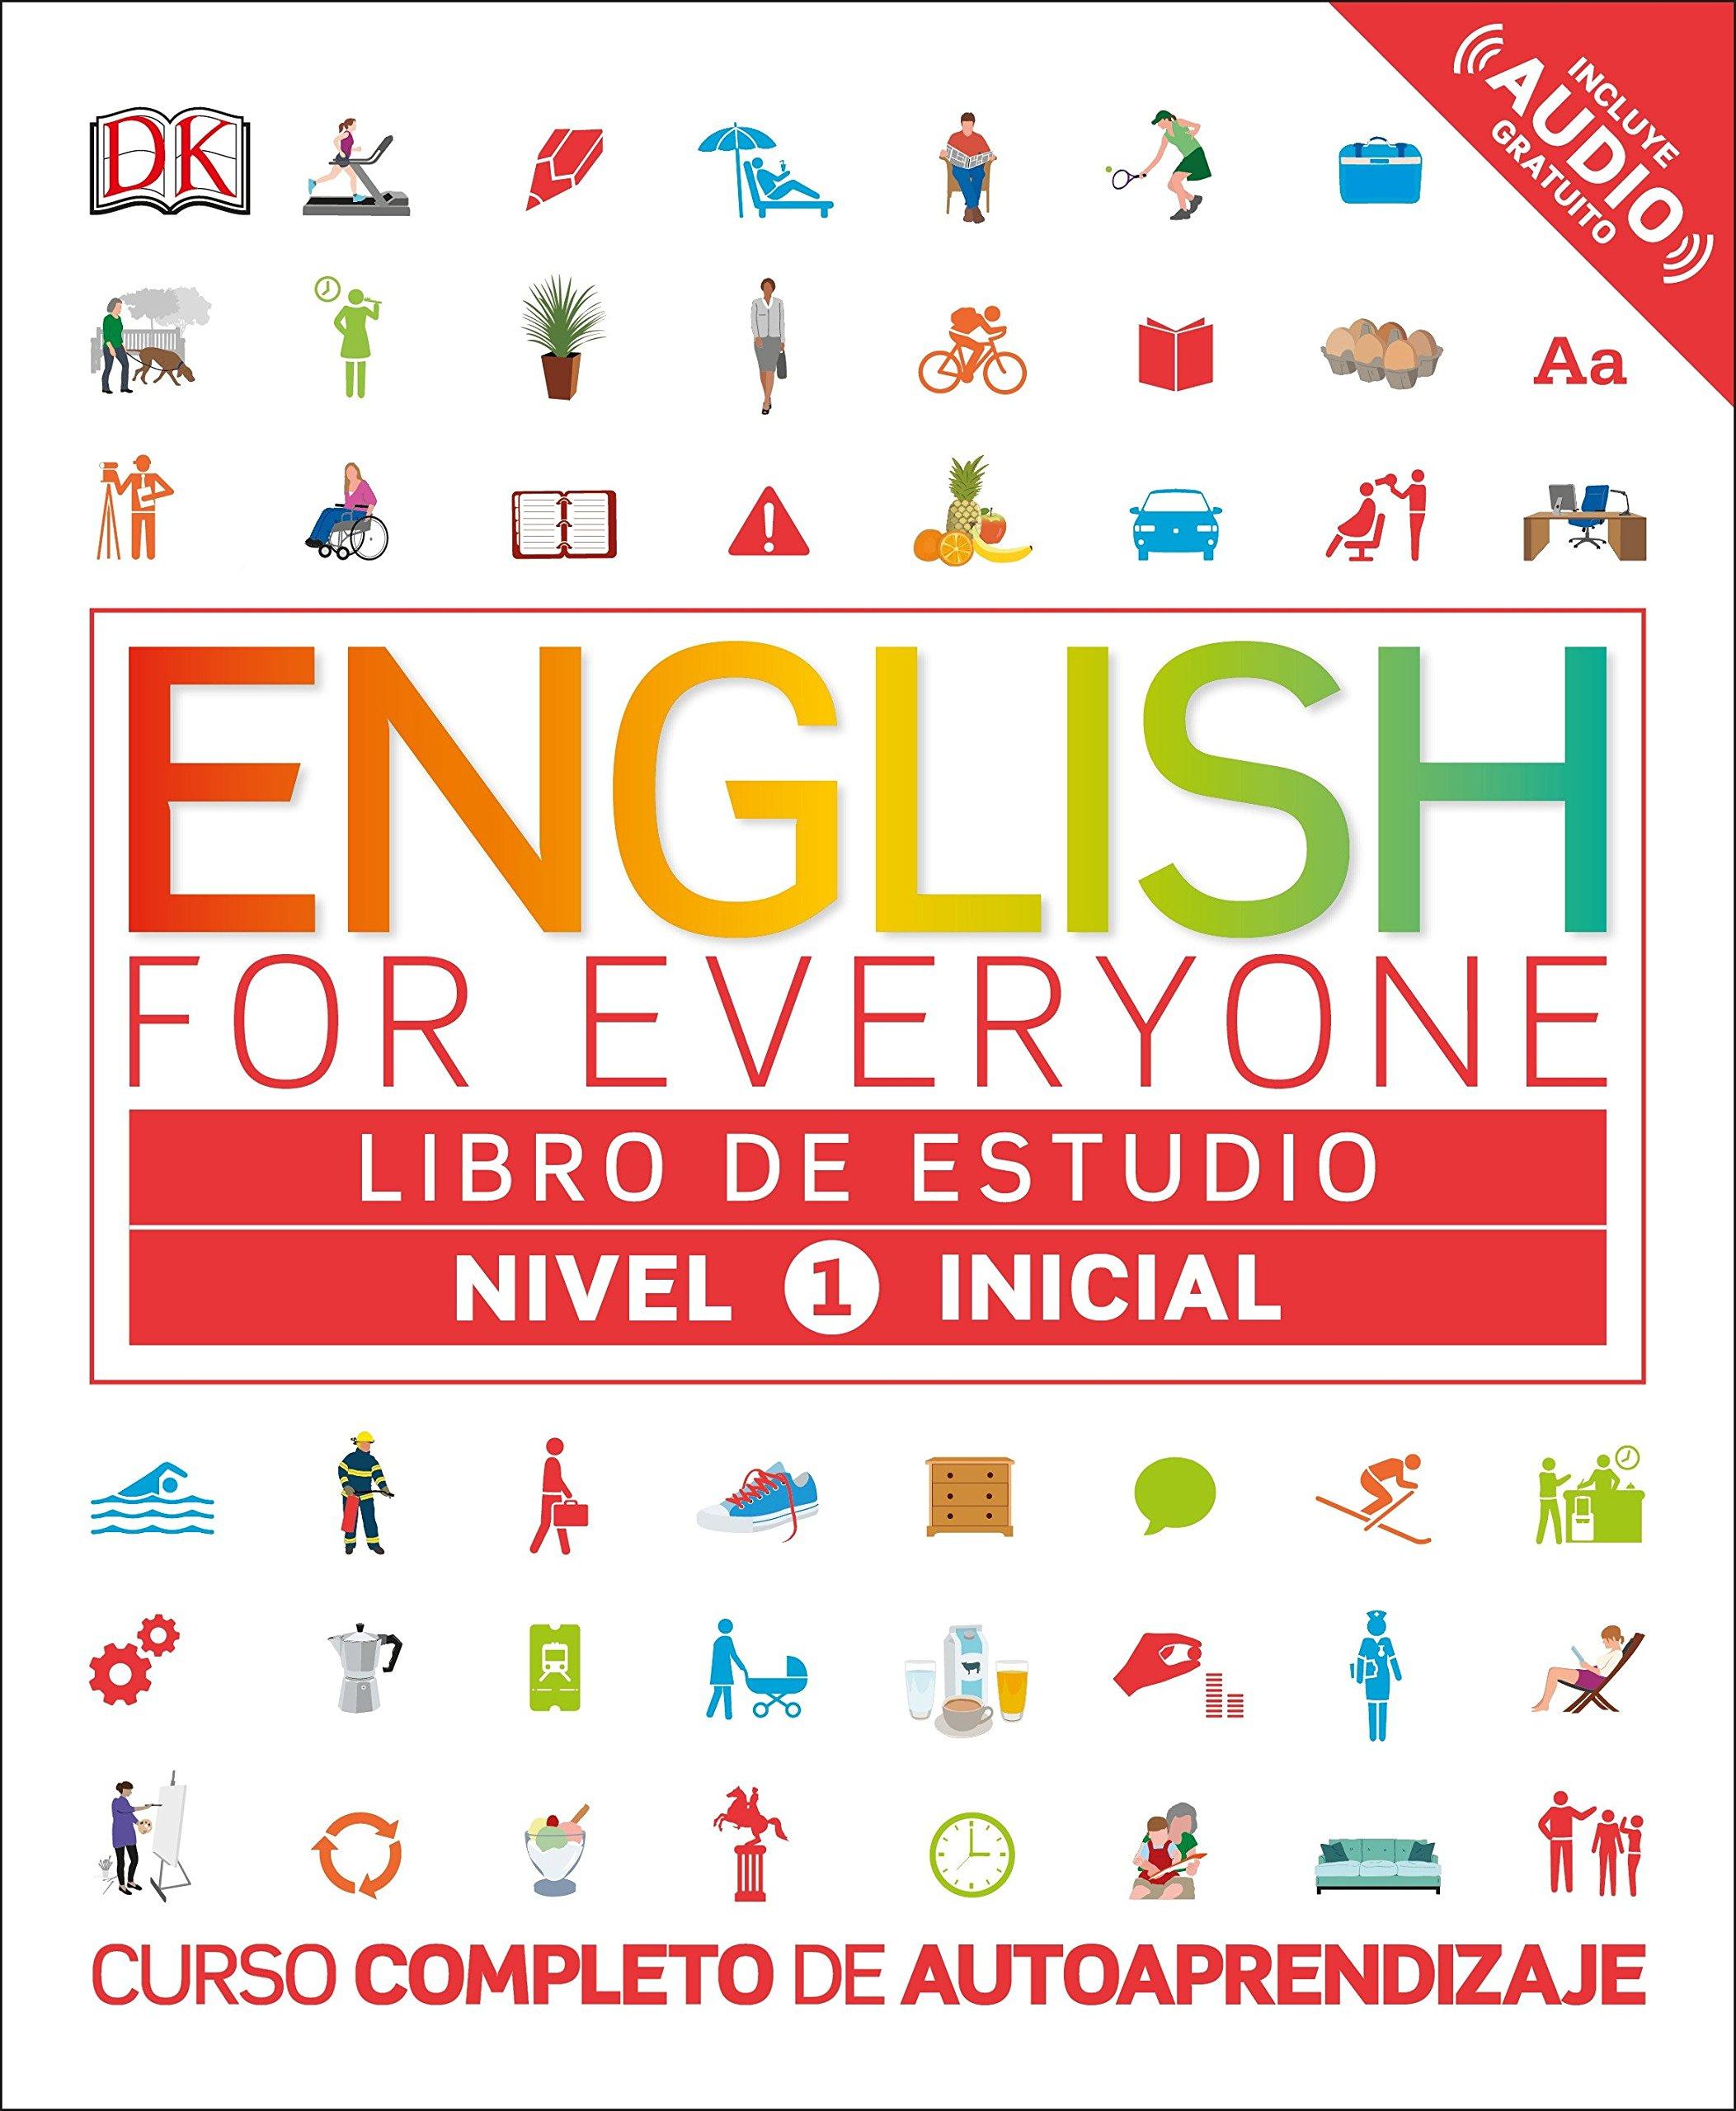 English For Everyone Nivel 1 Inicial Libro De Estudio Curso Completo De Autoaprendizaje Spanish Edition Dk 9781465462169 Books